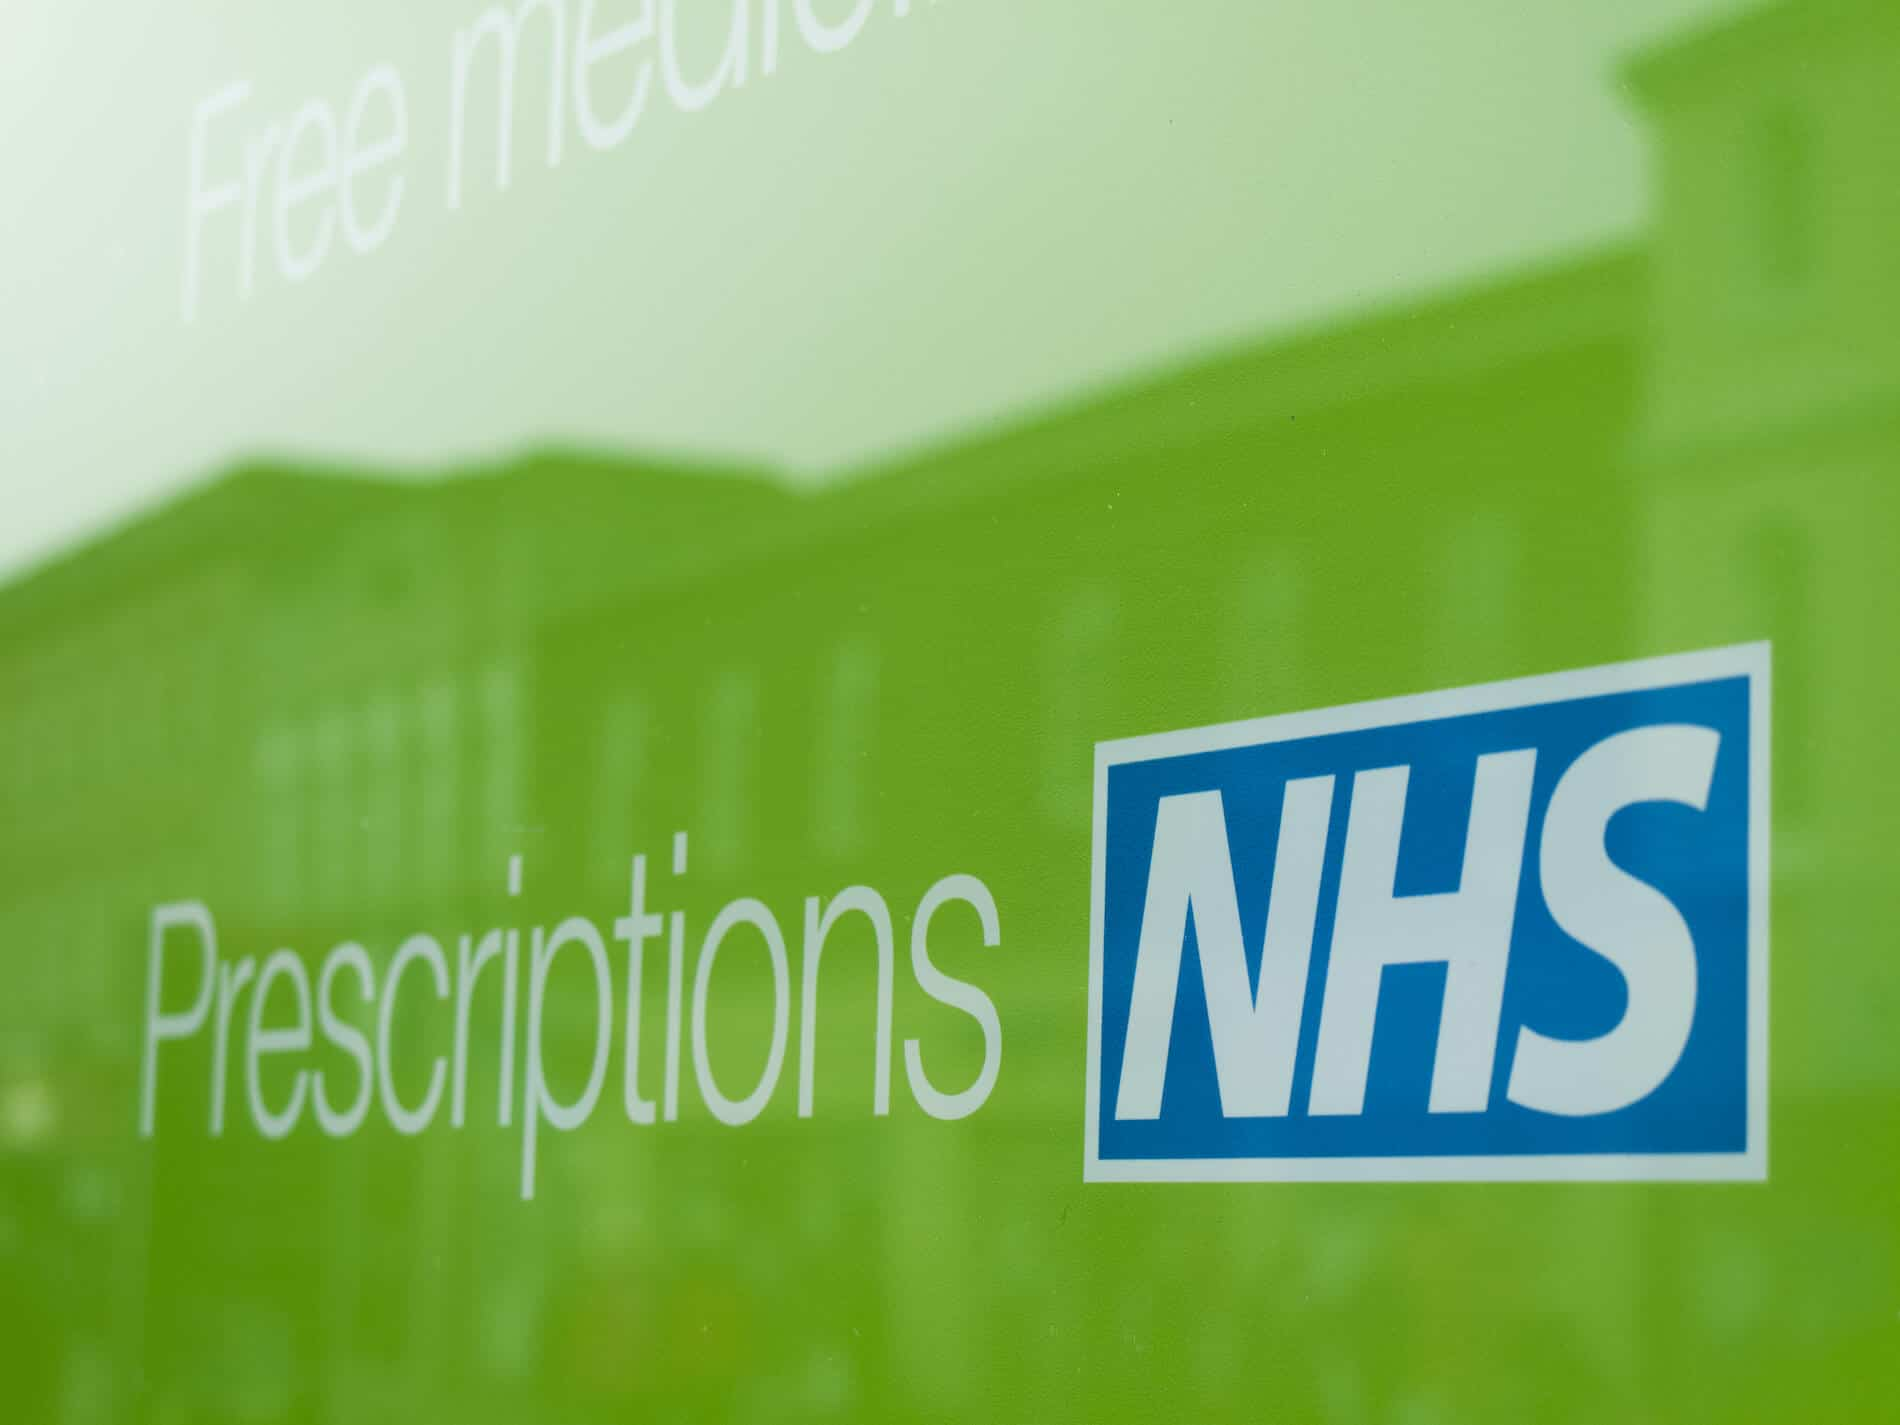 NHS Prescription Charges - The Hibbs Lupus Trust